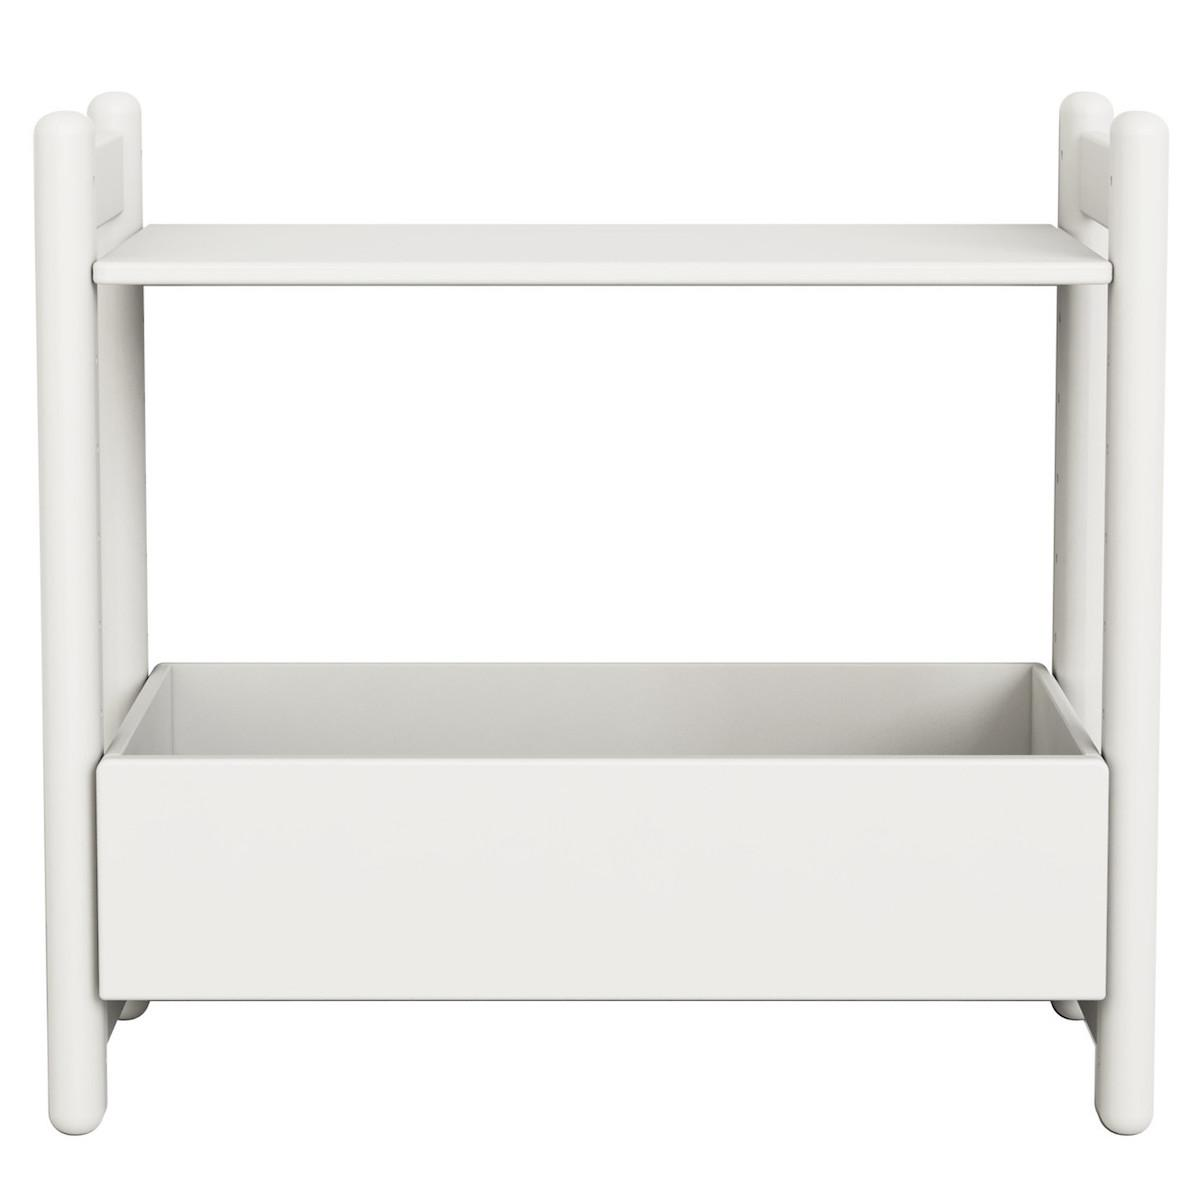 Mini D - Organizador 1 estante 74 cm SHELFIE Flexa blanco